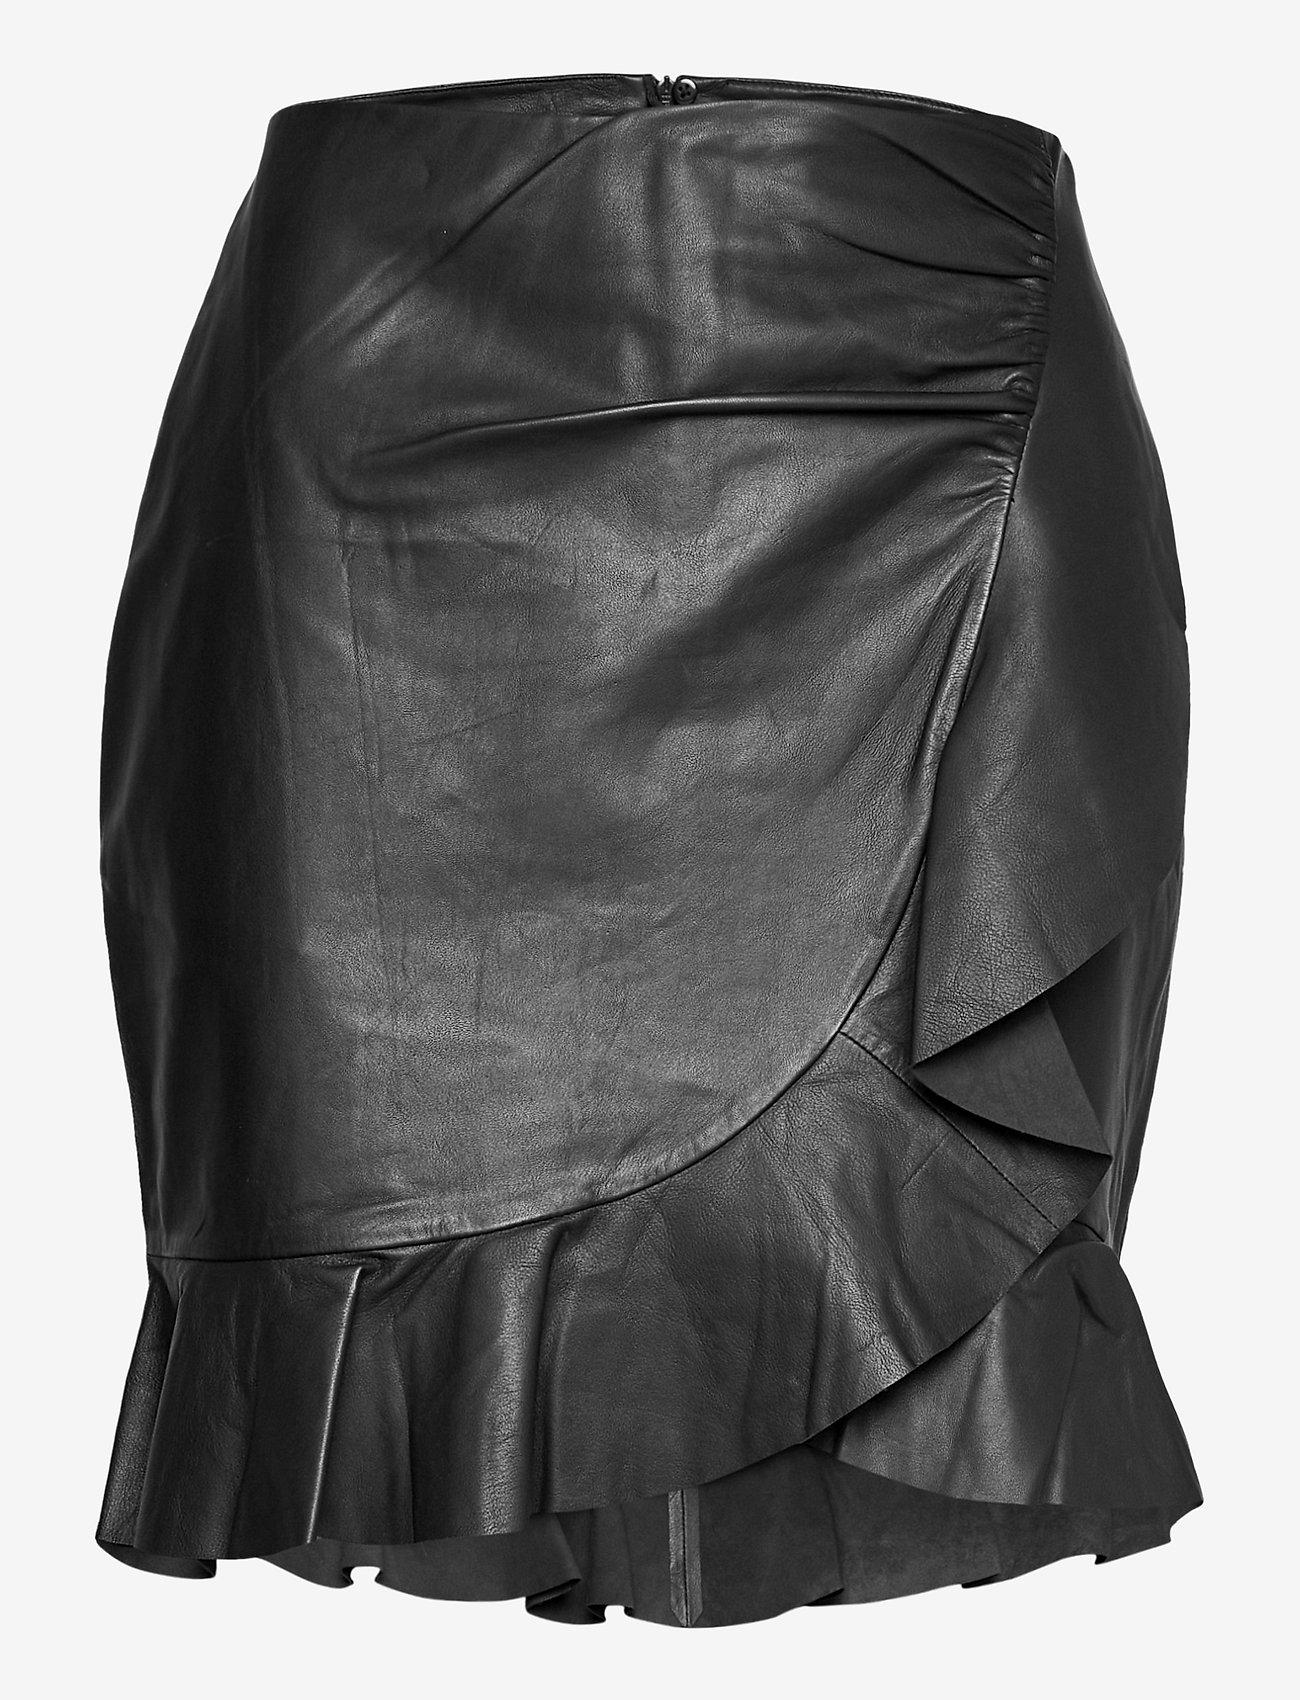 2NDDAY - 2ND Sprucia - short skirts - black - 0